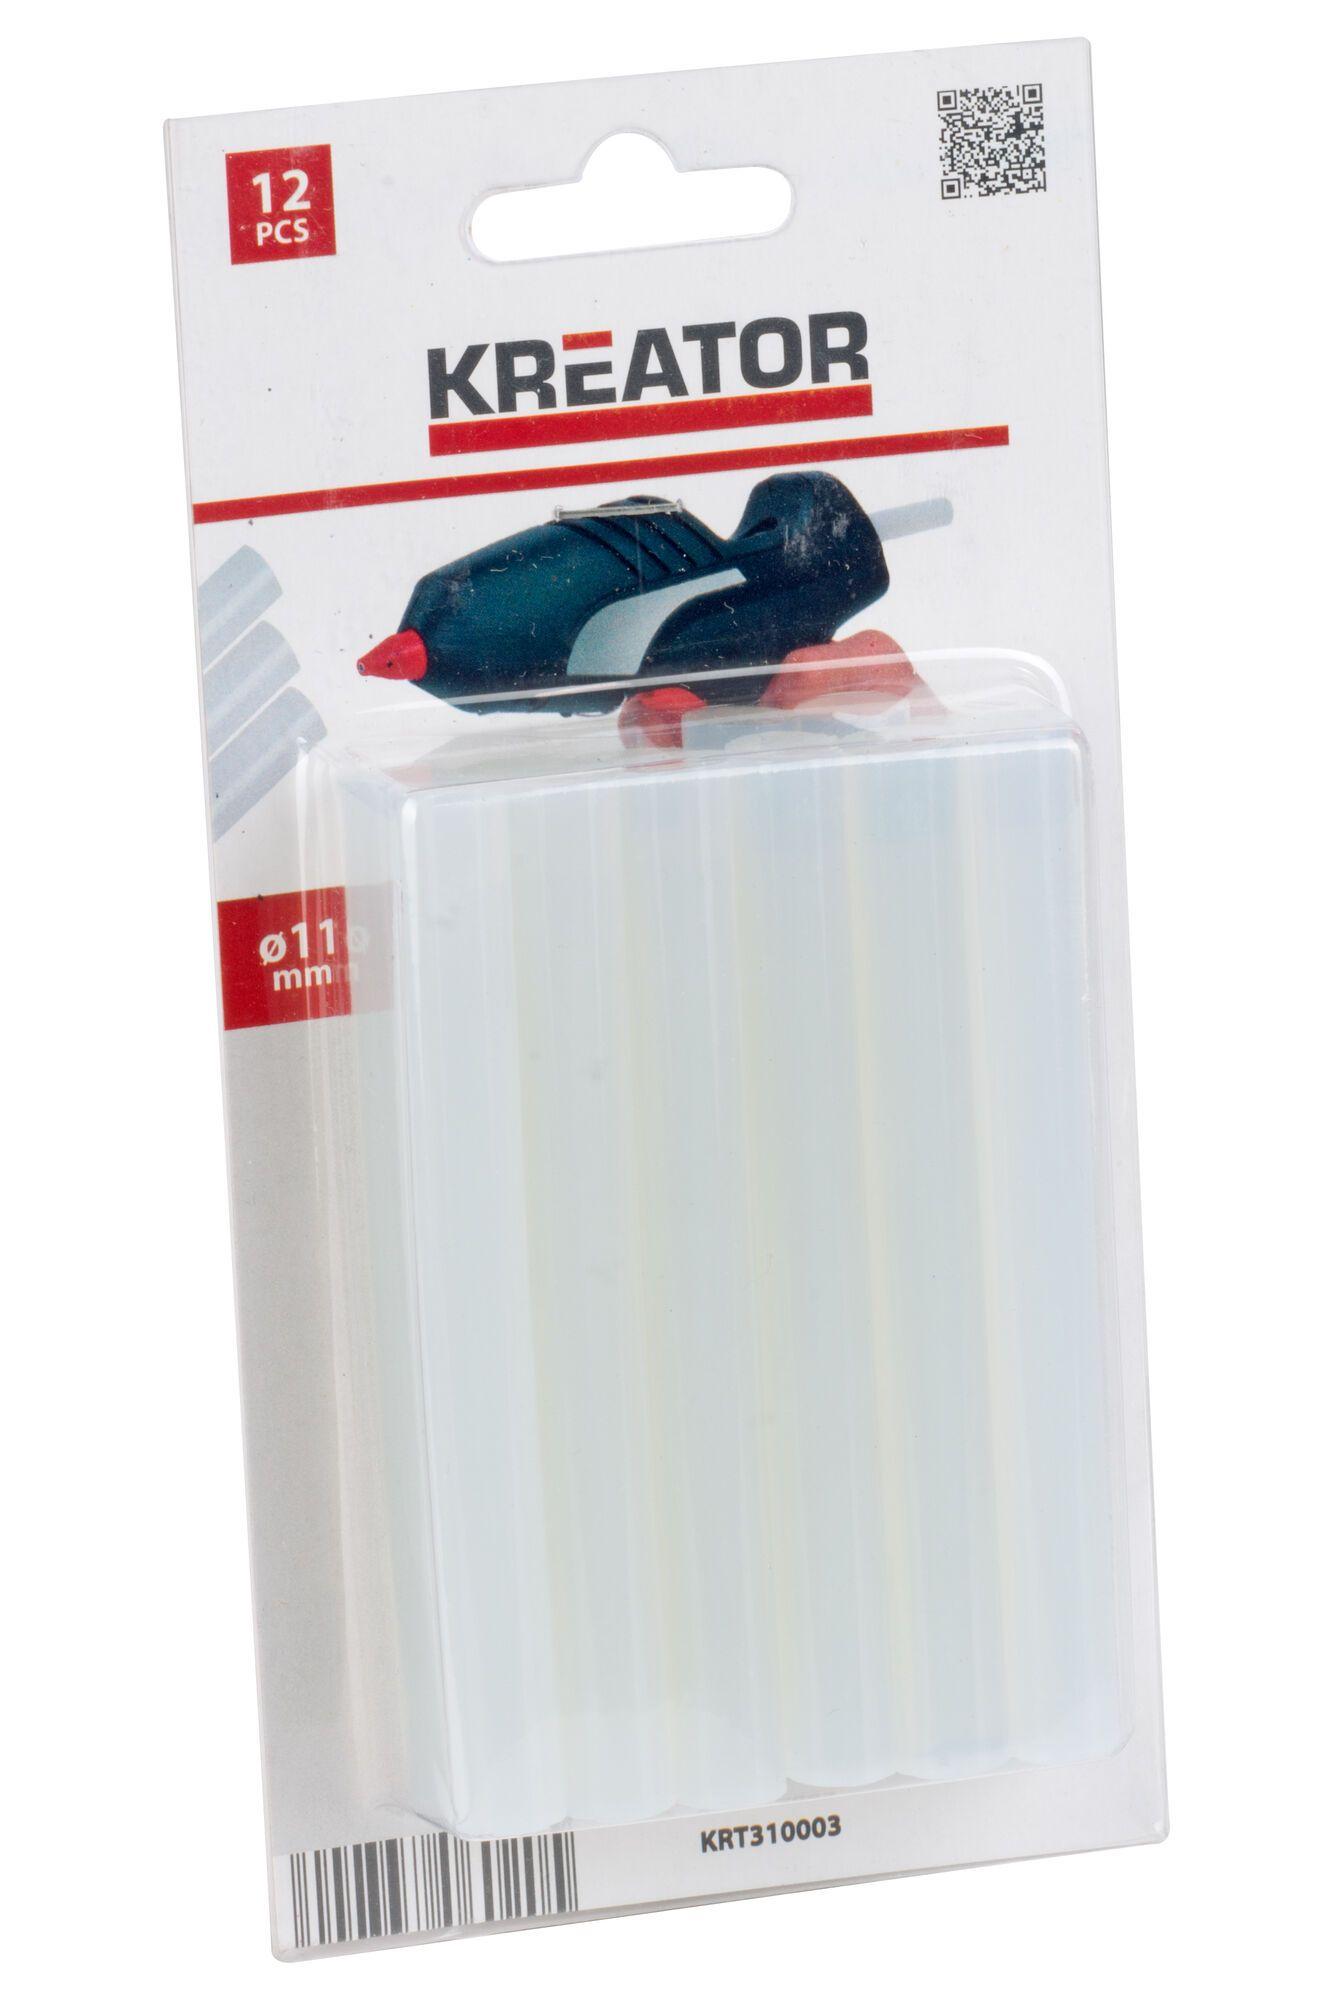 Kreator KRT310003 12 Lijmsticks voor lijmpistool | 11 mm gluesticks